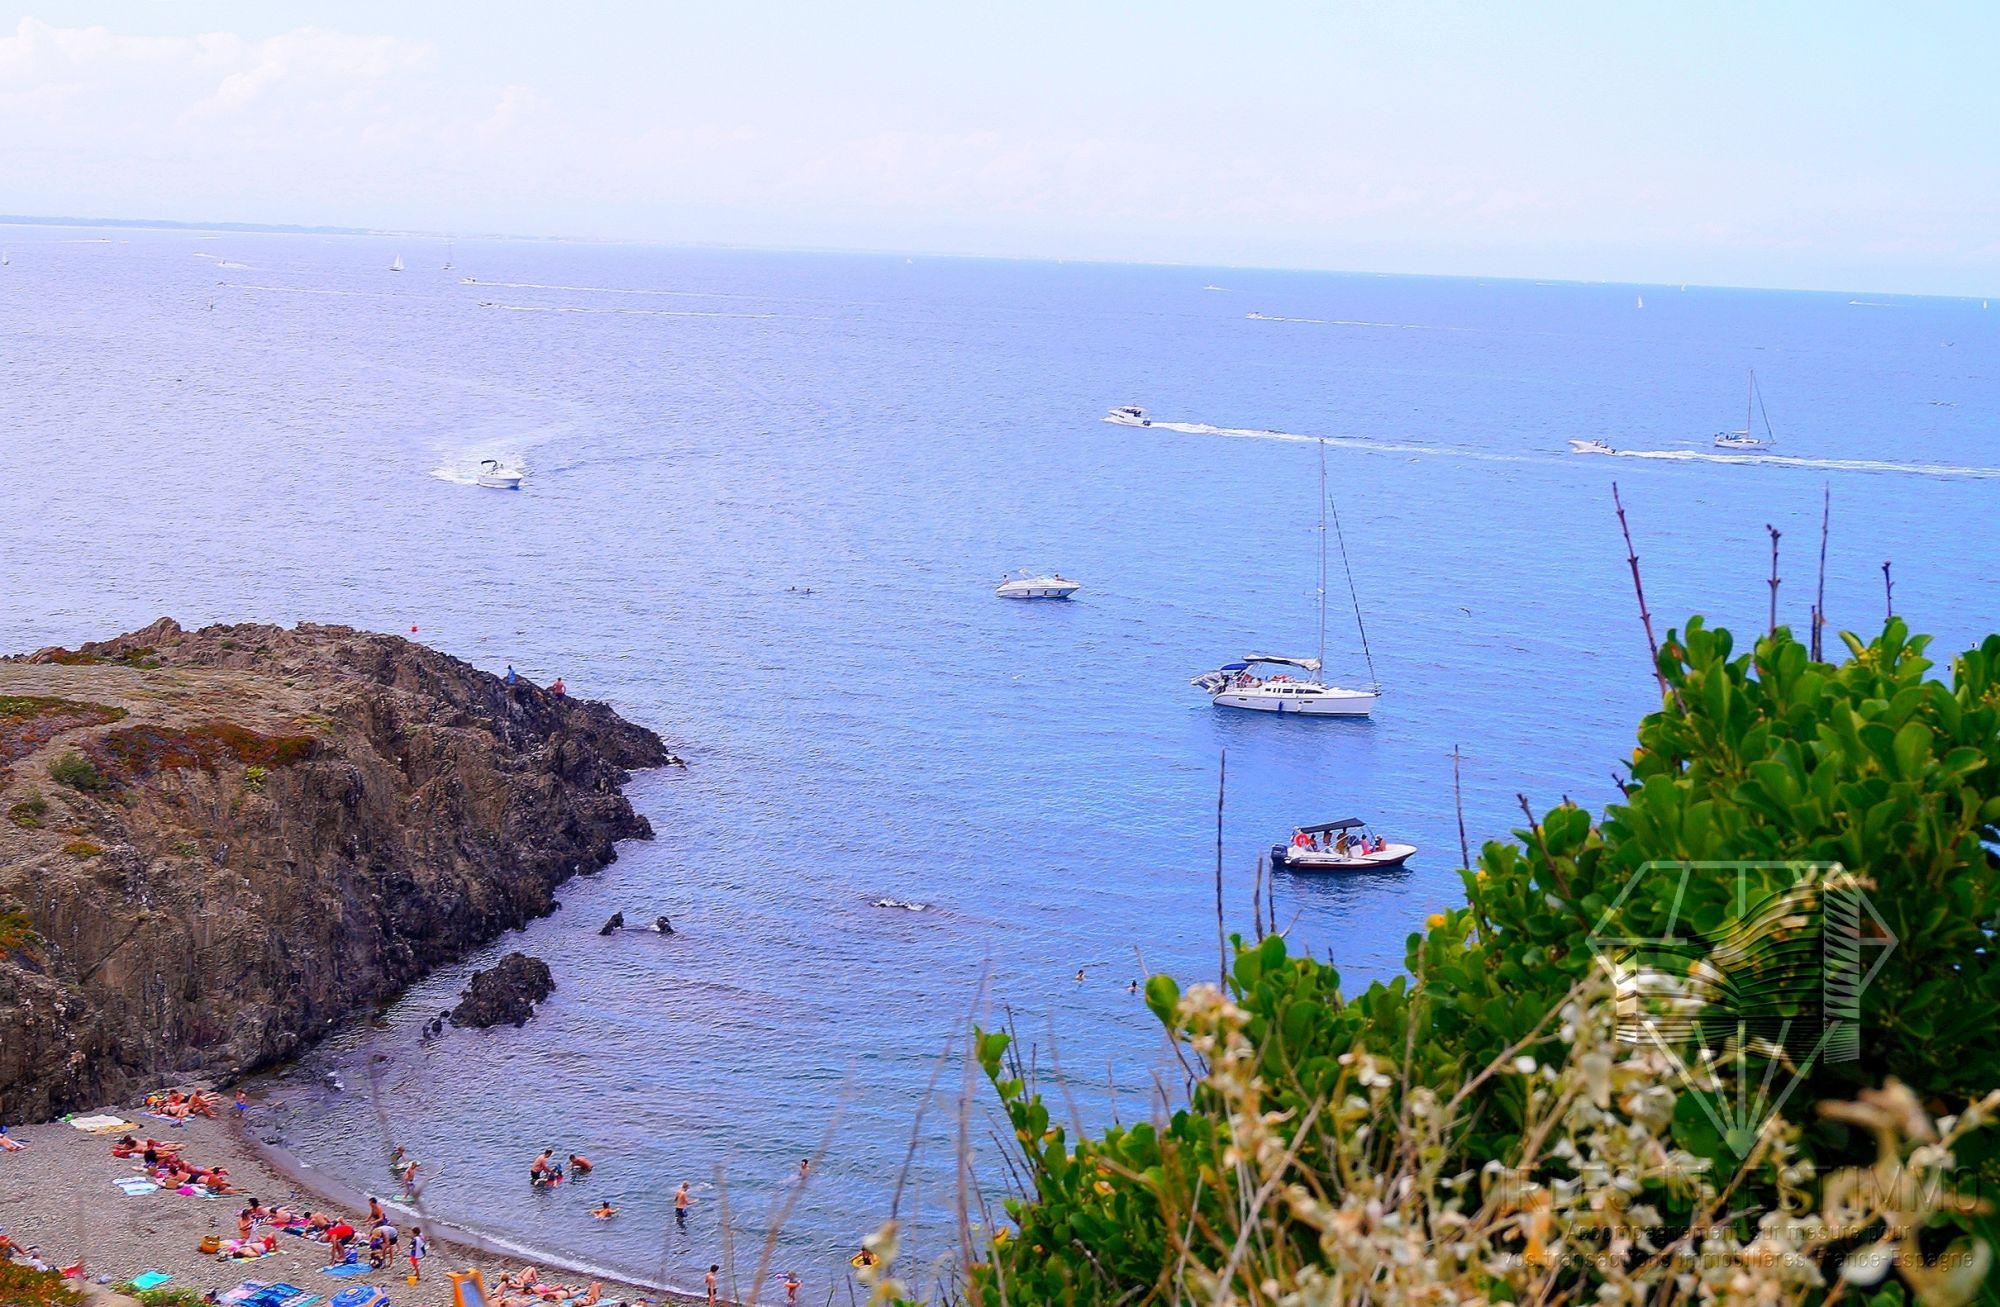 Vente appartement neuf programme immobilier vue mer port vendres languedoc roussillon pyrenees - Immobilier port vendres pyrenees orientales ...